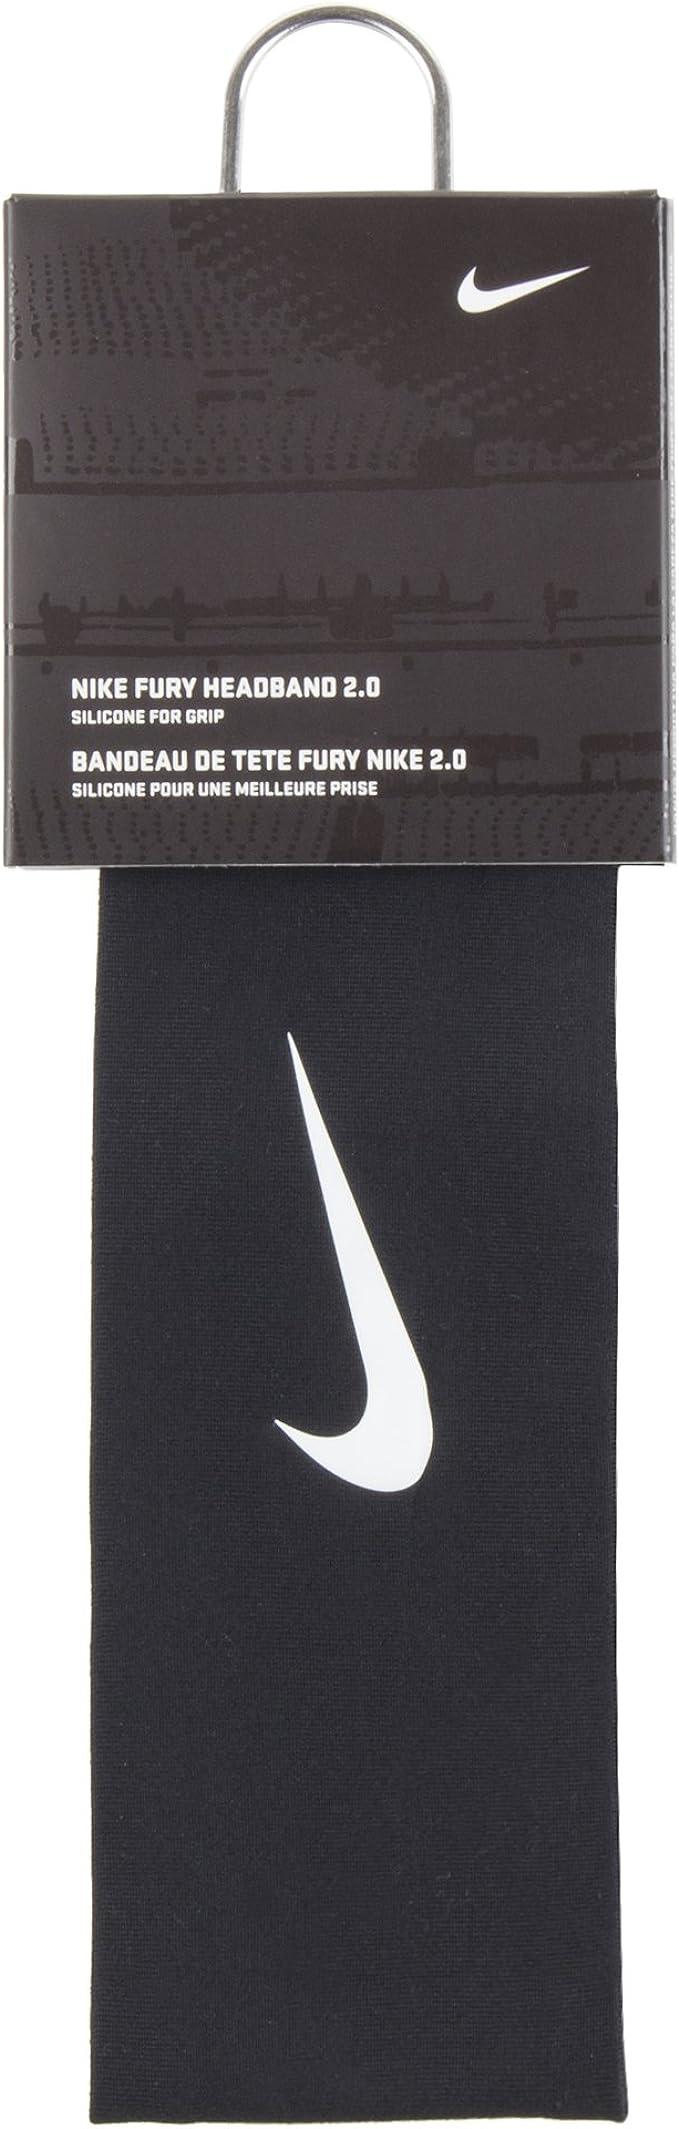 Nike Mens Headbands For Long Hair